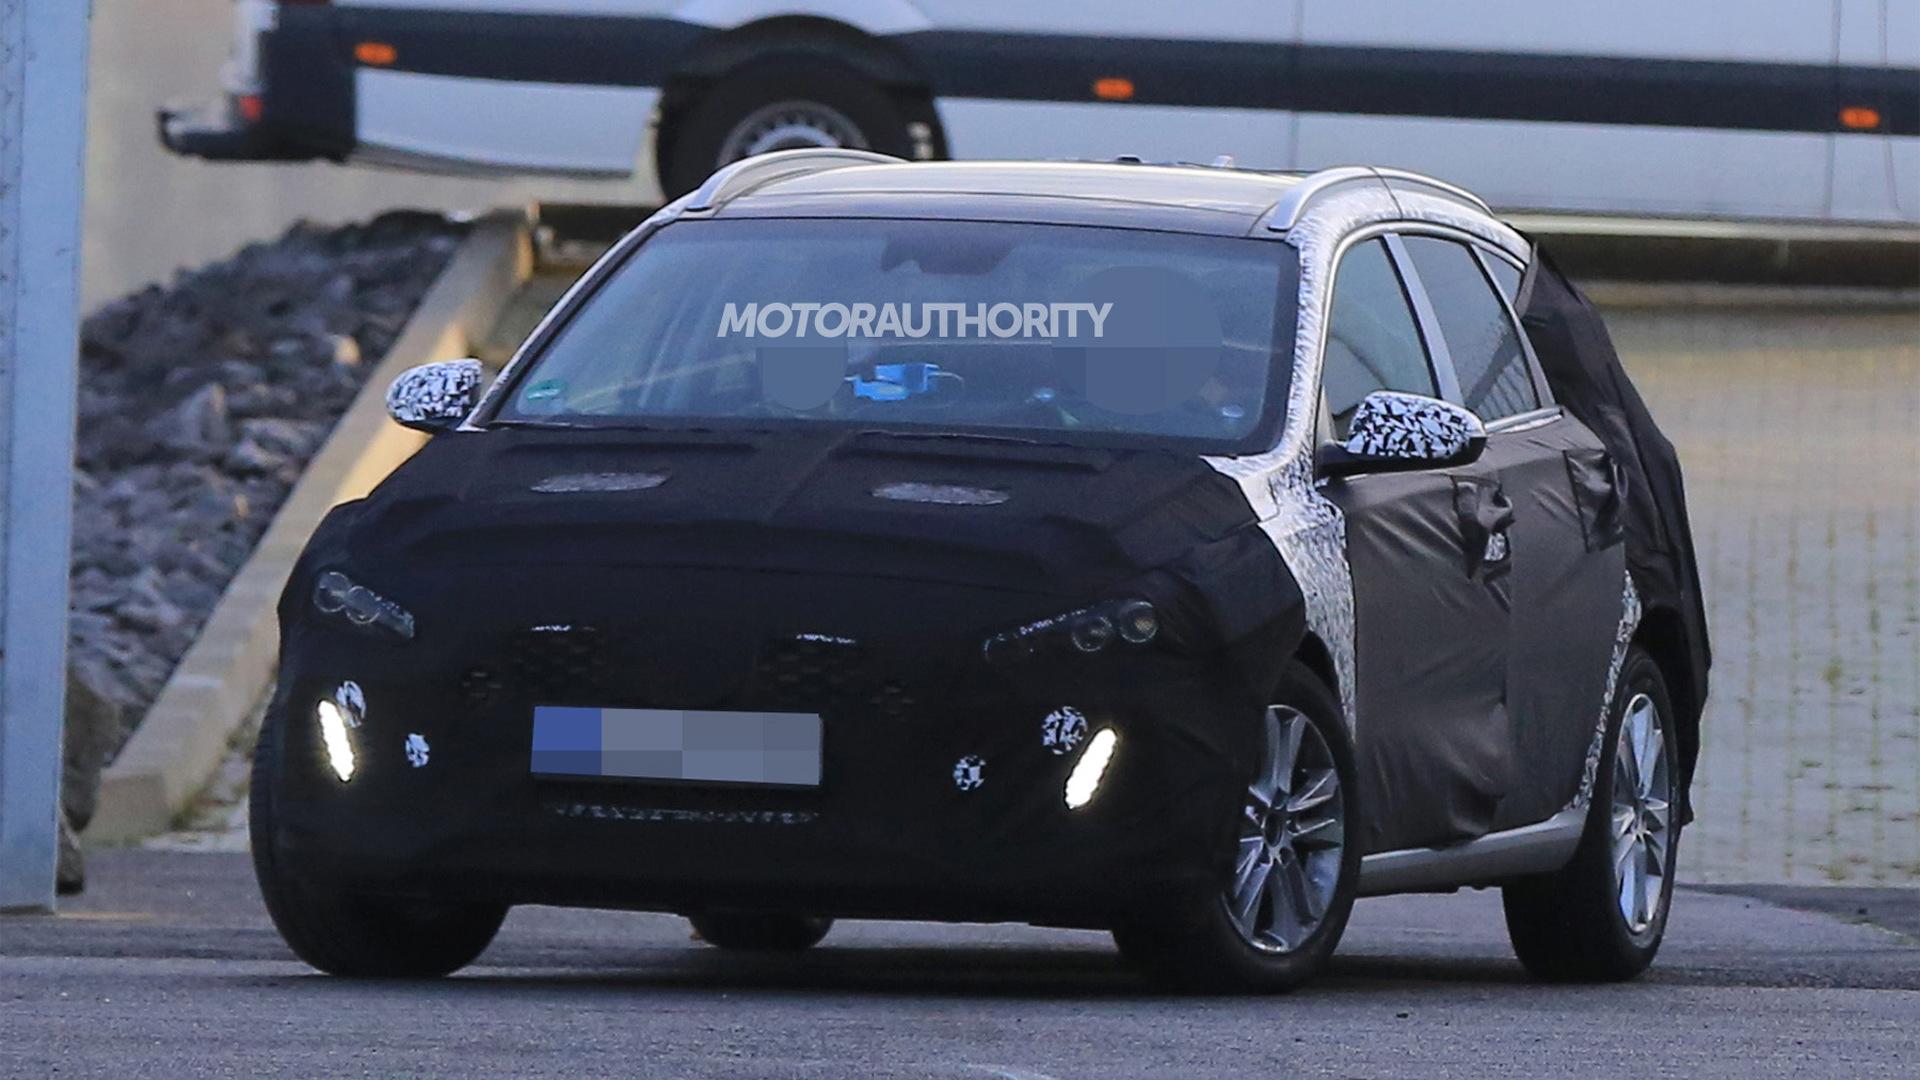 2018 Hyundai Elantra Touring (i30 Tourer) spy shots - Image via S. Baldauf/SB-Medien